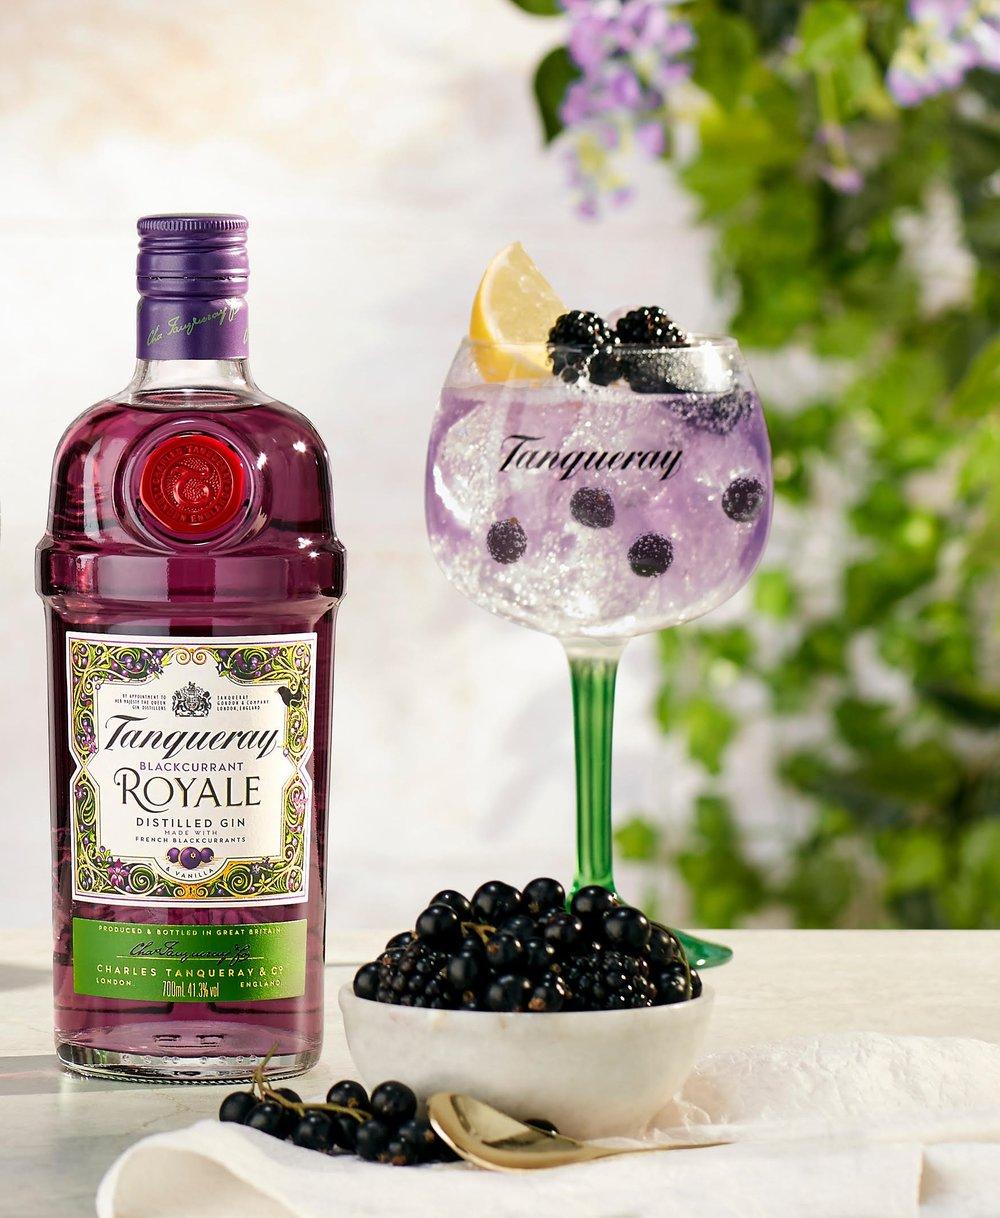 AD Miniabo + Tanqueray Gin Set Blackcurrant Royale